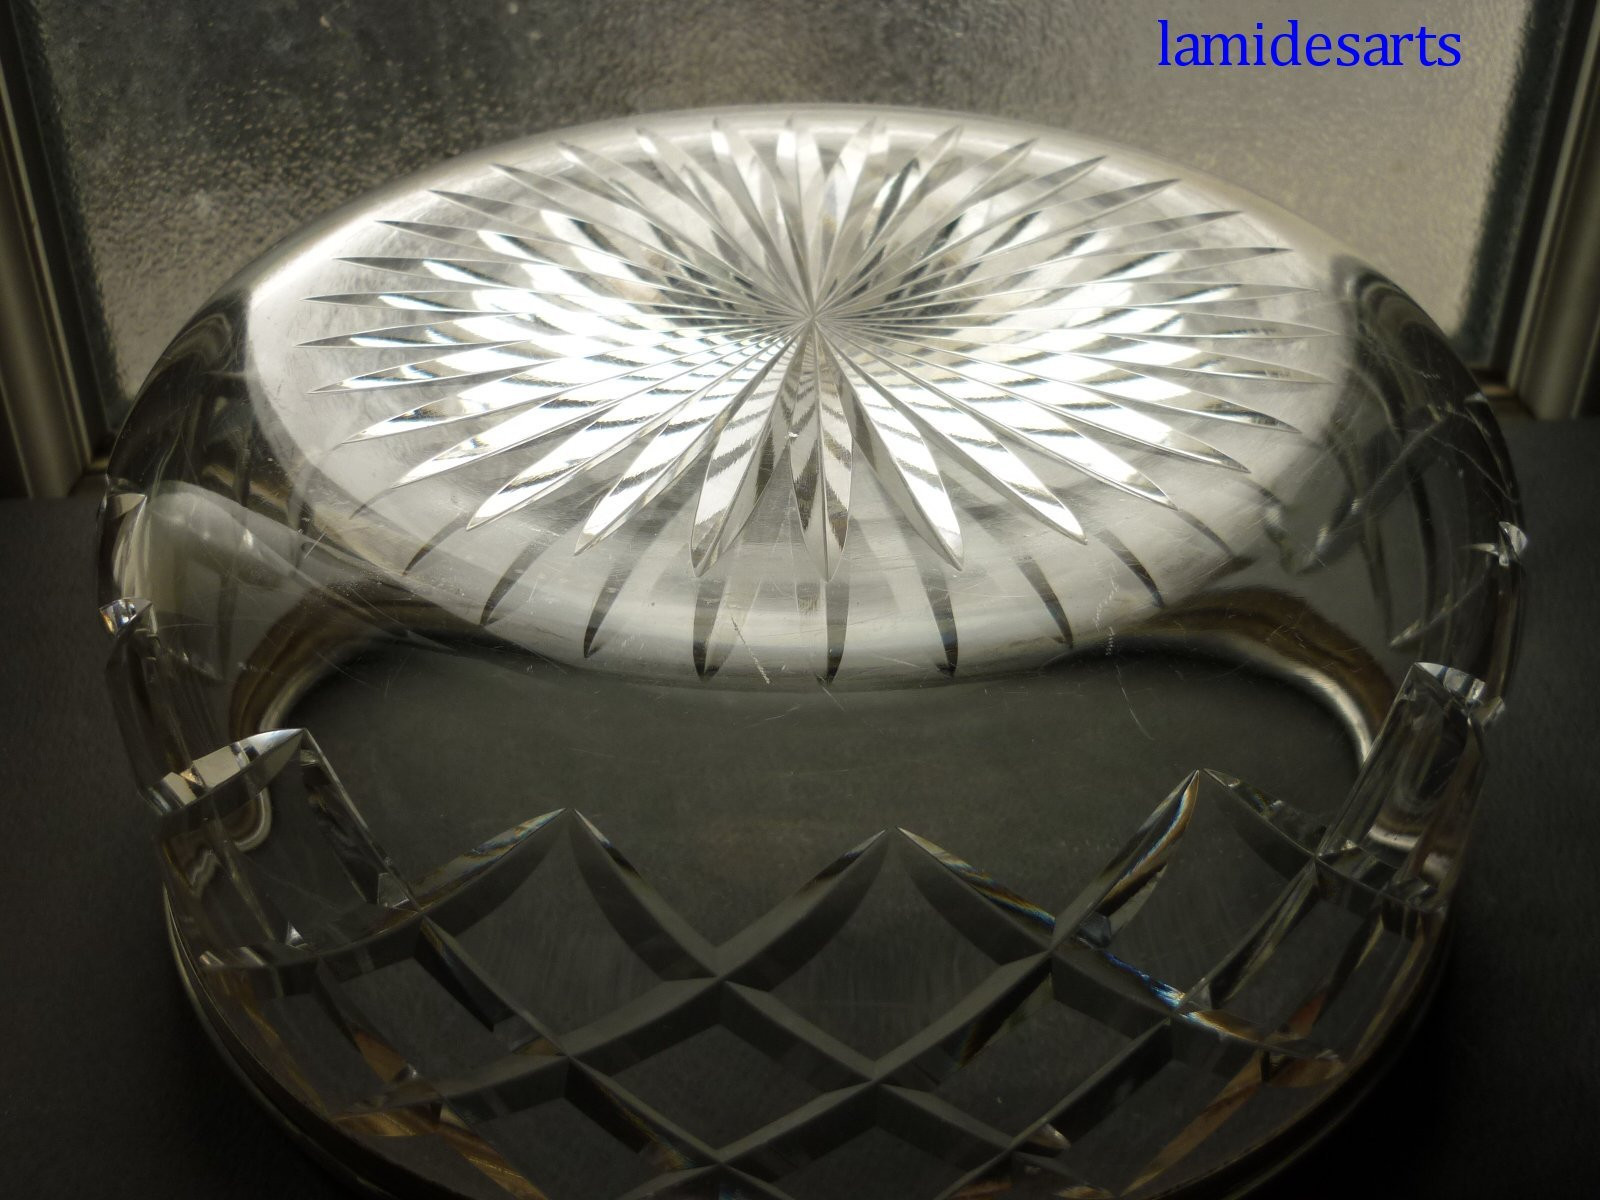 30 Great Baccarat Crystal Vase